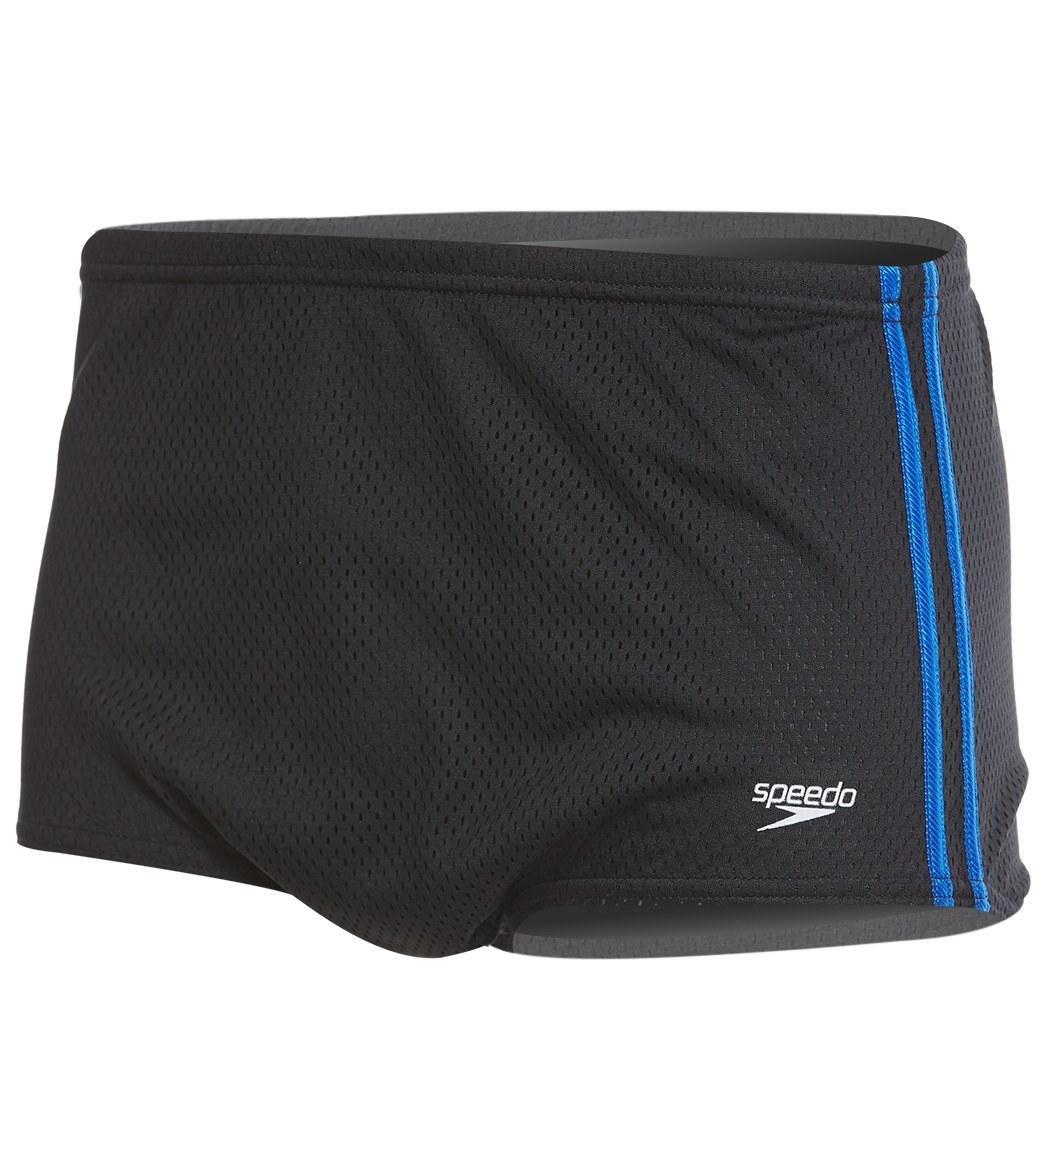 Speedo Solid Poly Mesh Square Leg Swimsuit